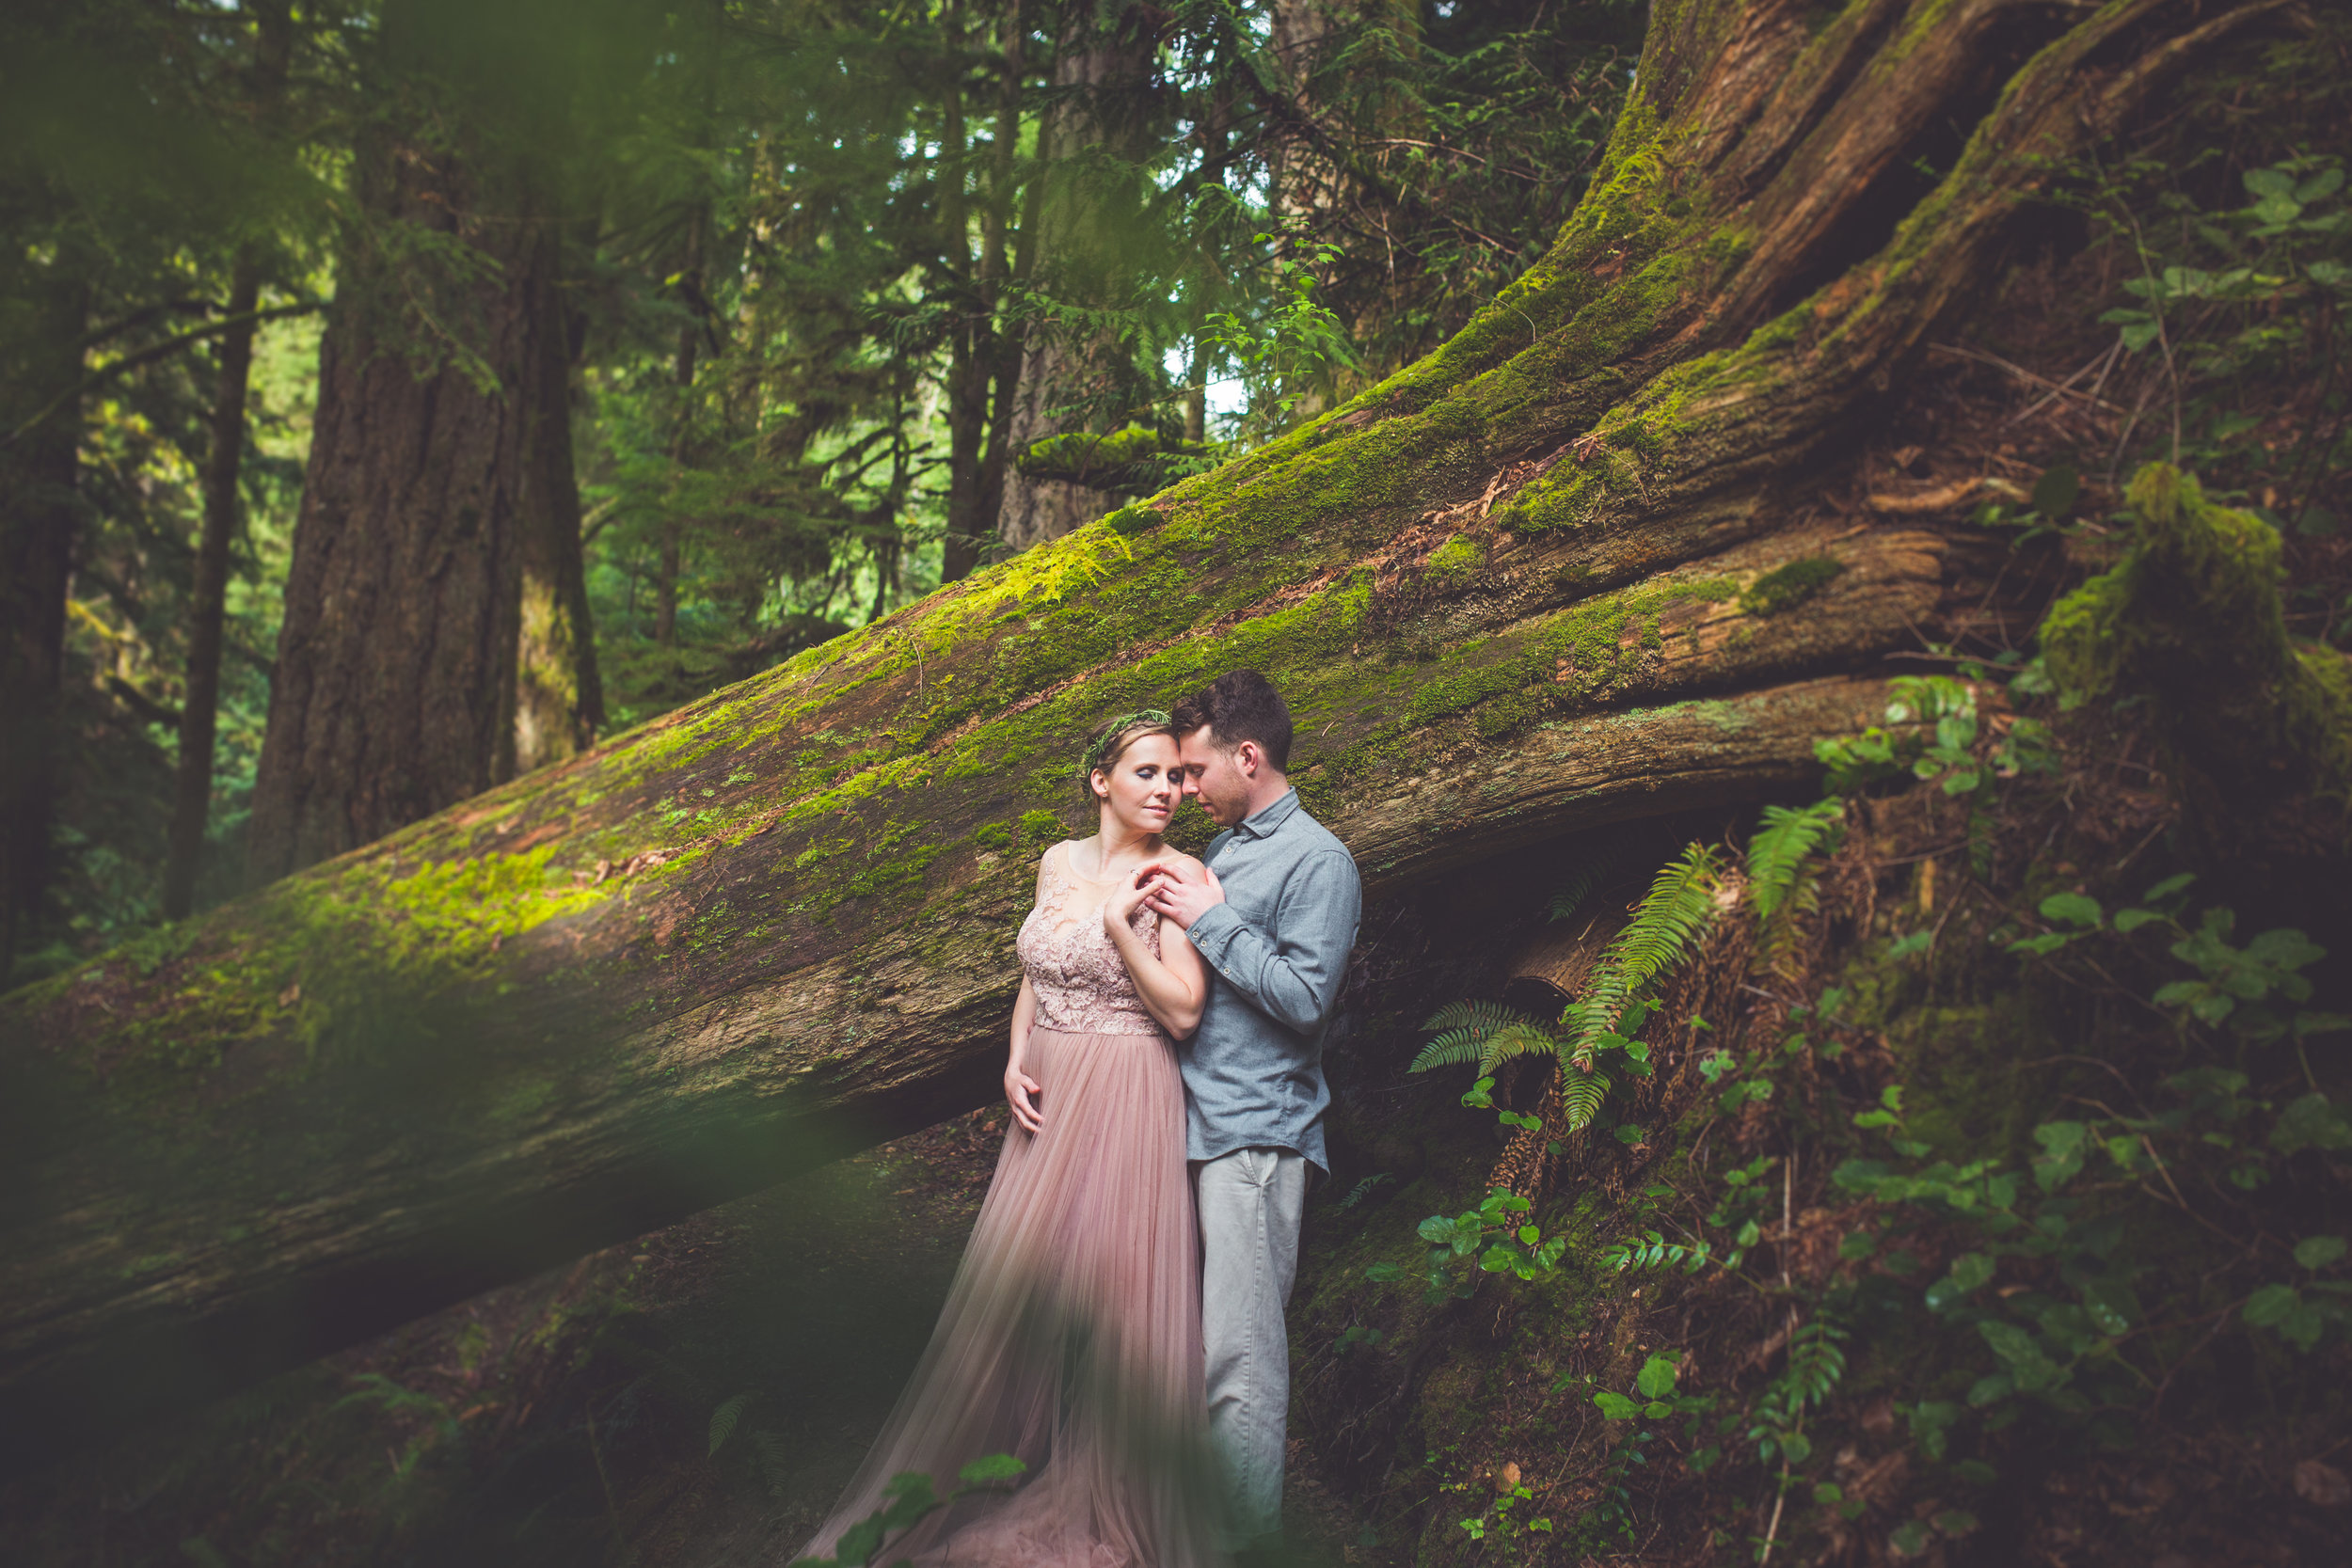 Whimsical Wedding Photographer Vancouver Island BC